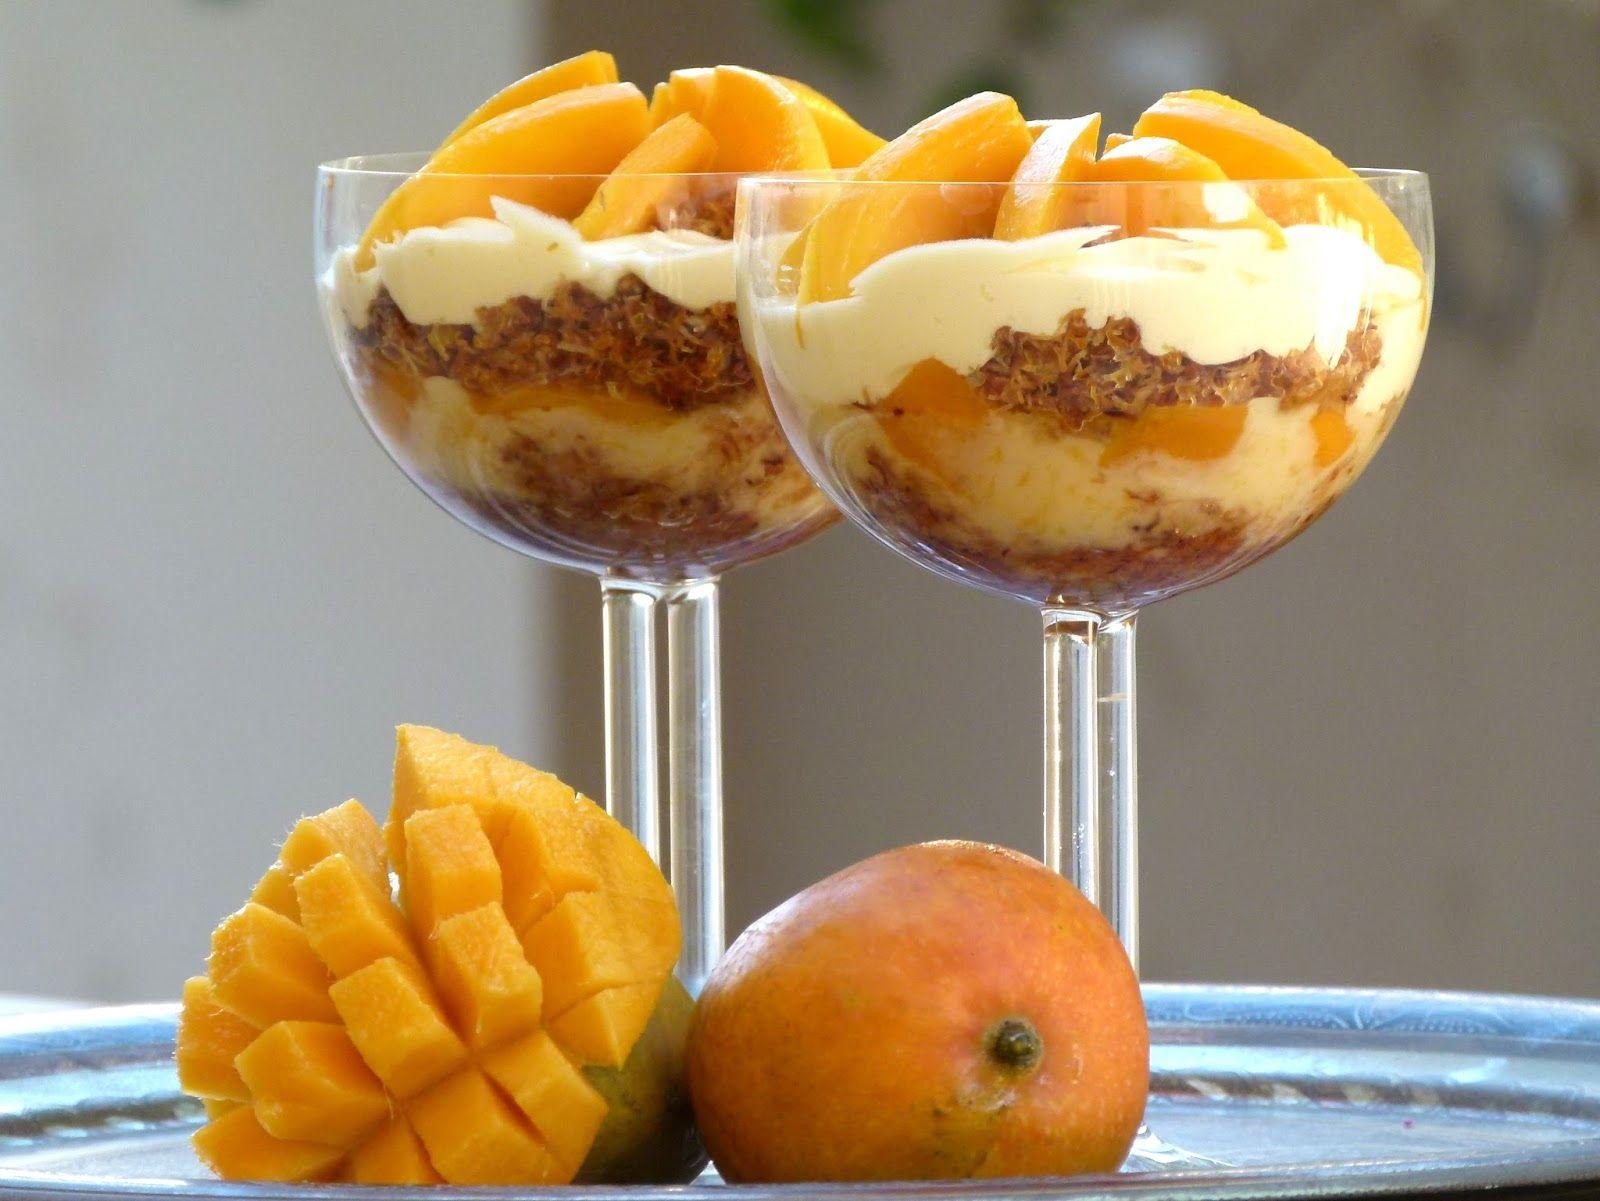 mango kunafa schichtdessert im glas rezept gypten ramadan egypt pinterest. Black Bedroom Furniture Sets. Home Design Ideas